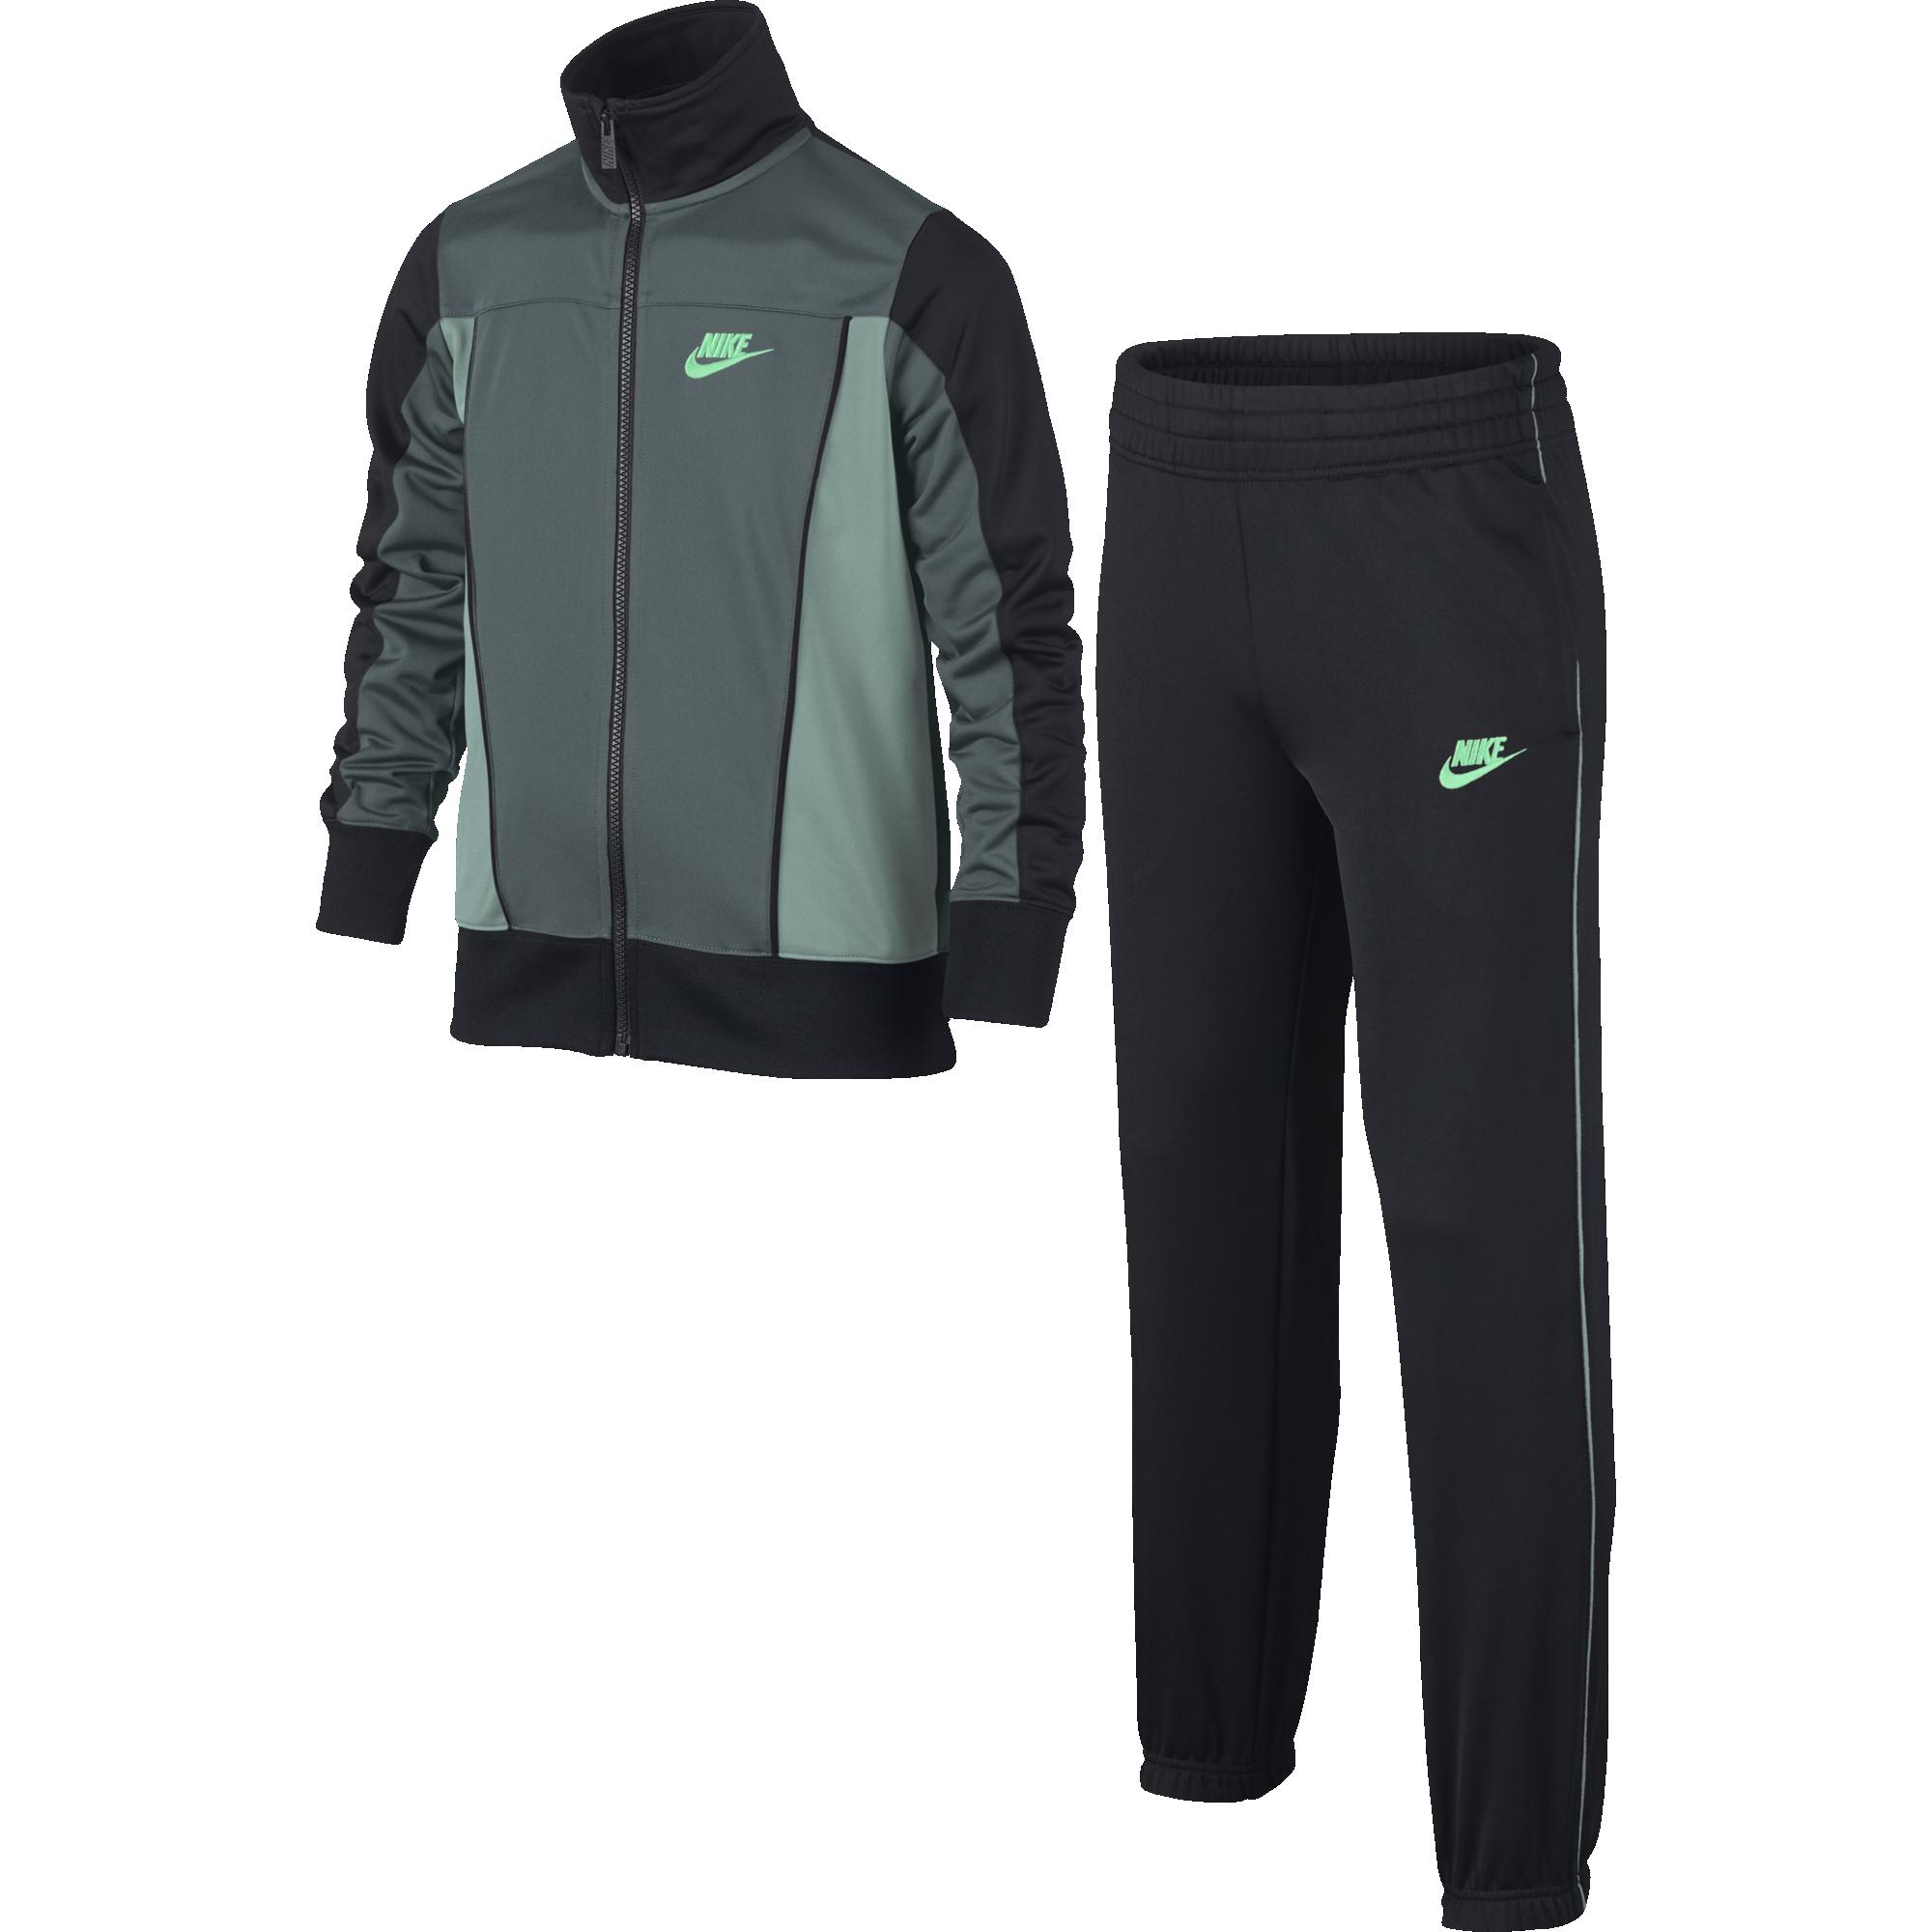 e76b75174e Nike B Nsw Trk Suit Pac Poly 805472-392 Fiú Melegítő   Melegítő